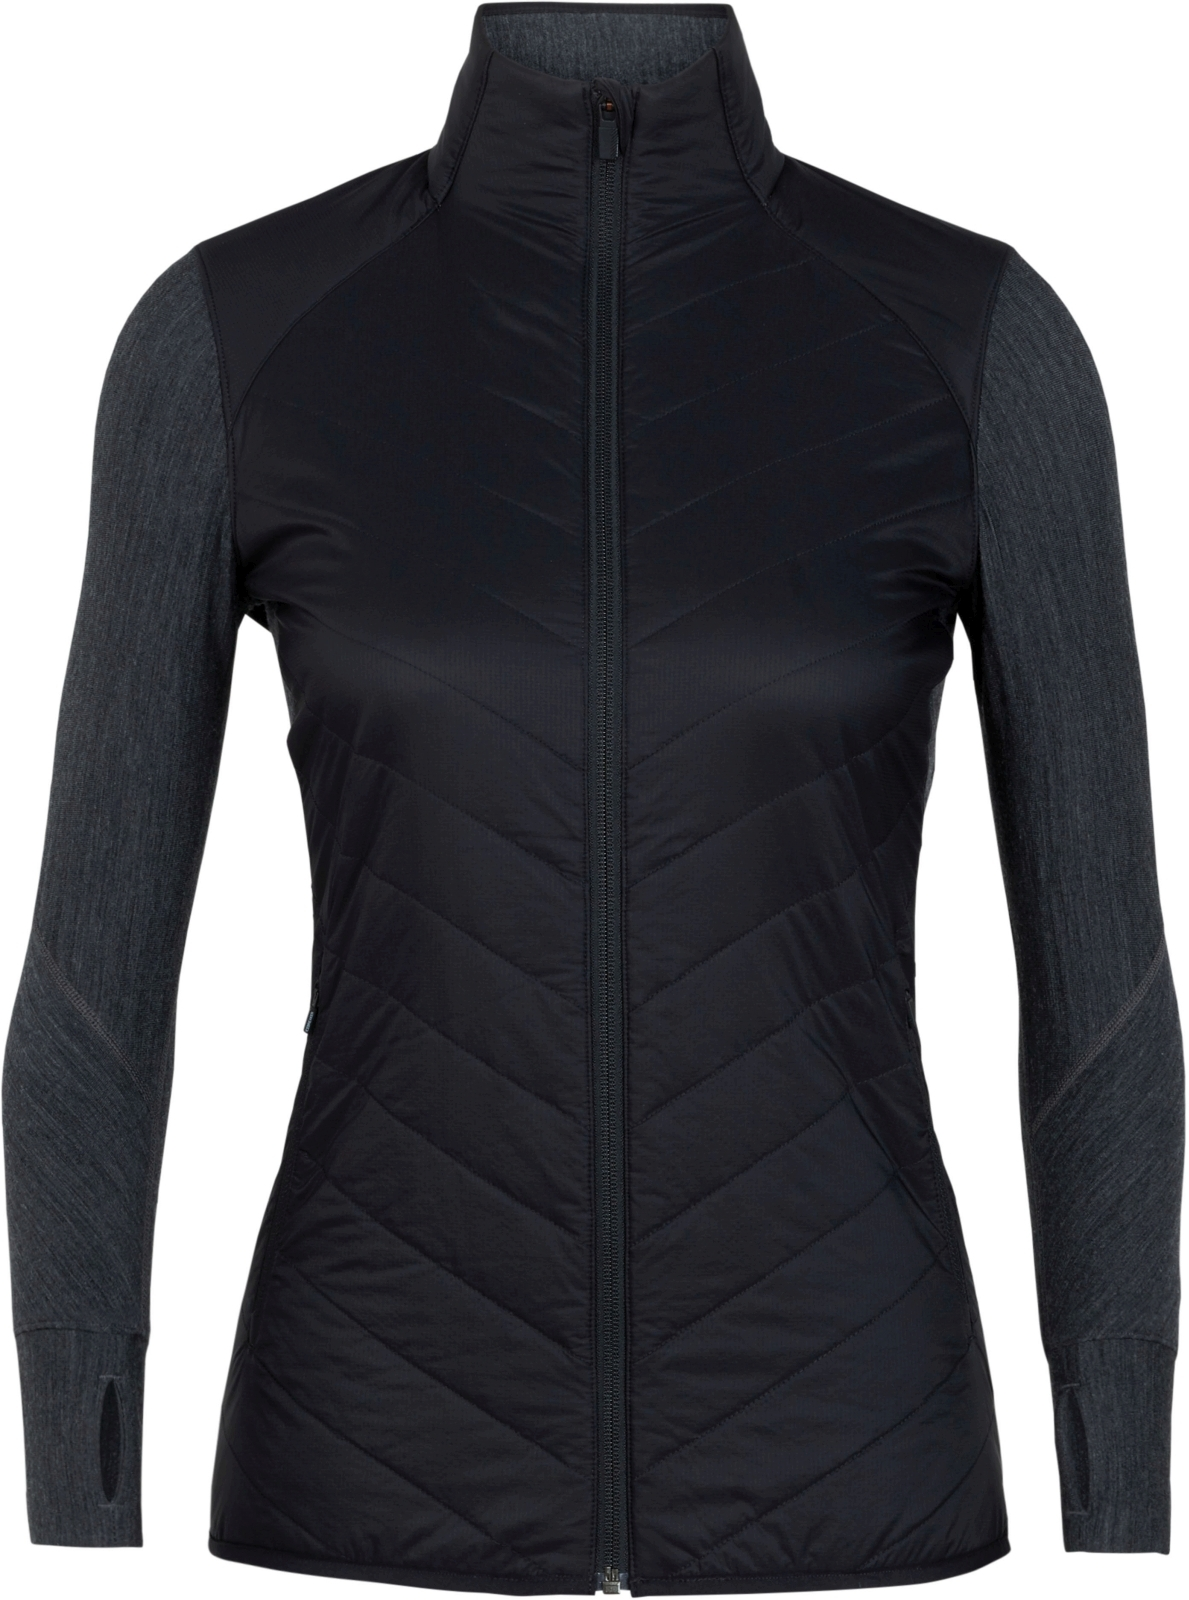 Icebreaker Womens Descender Hybrid Jacket - black/jet hthr XL